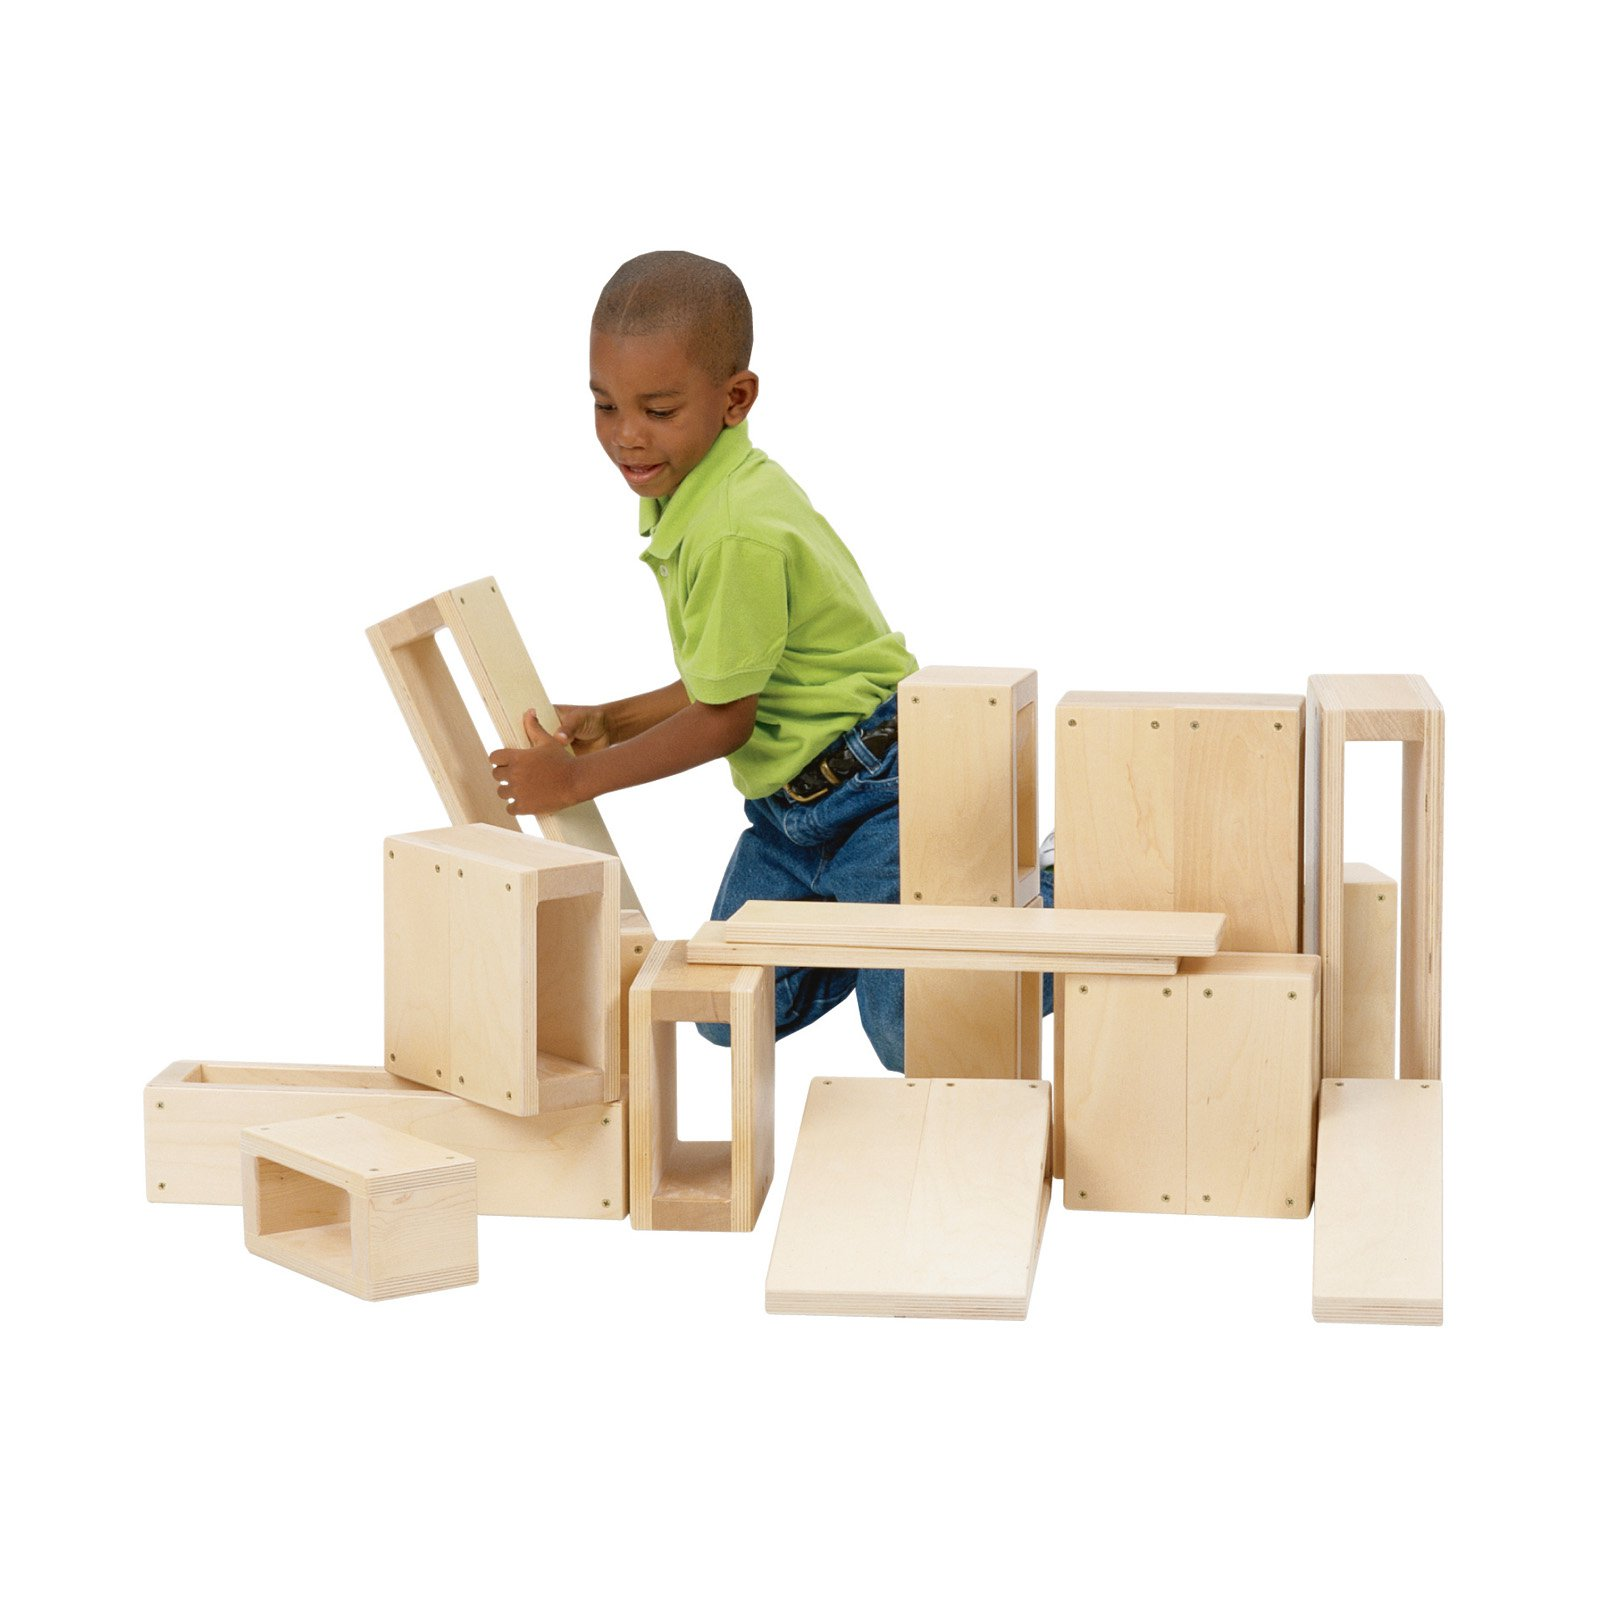 Guidecraft Jr Hollow Blocks